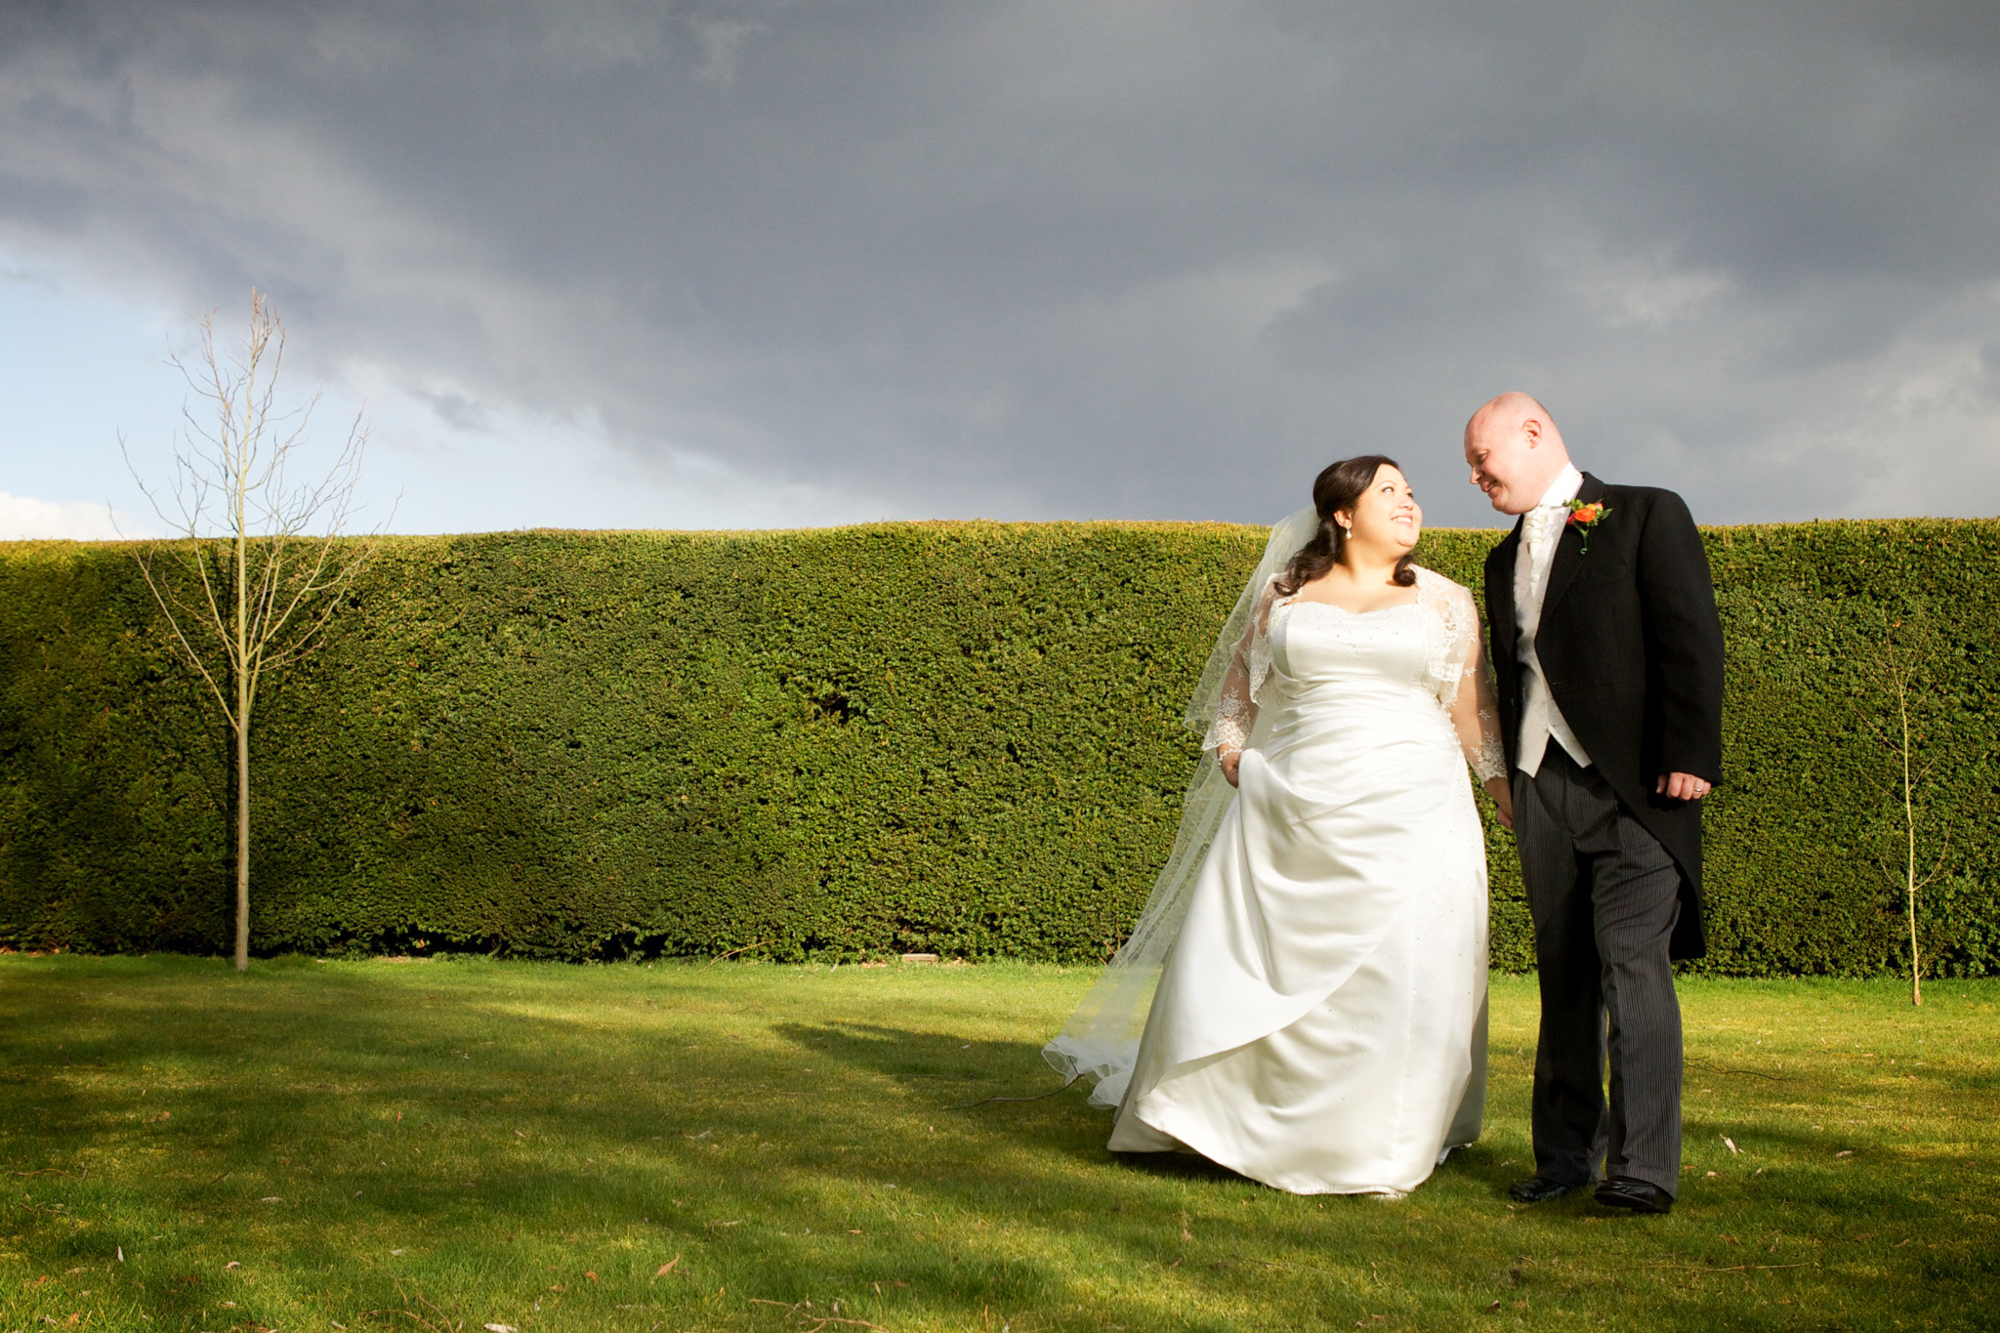 oaks farm wedding outdoor bride and groom walking